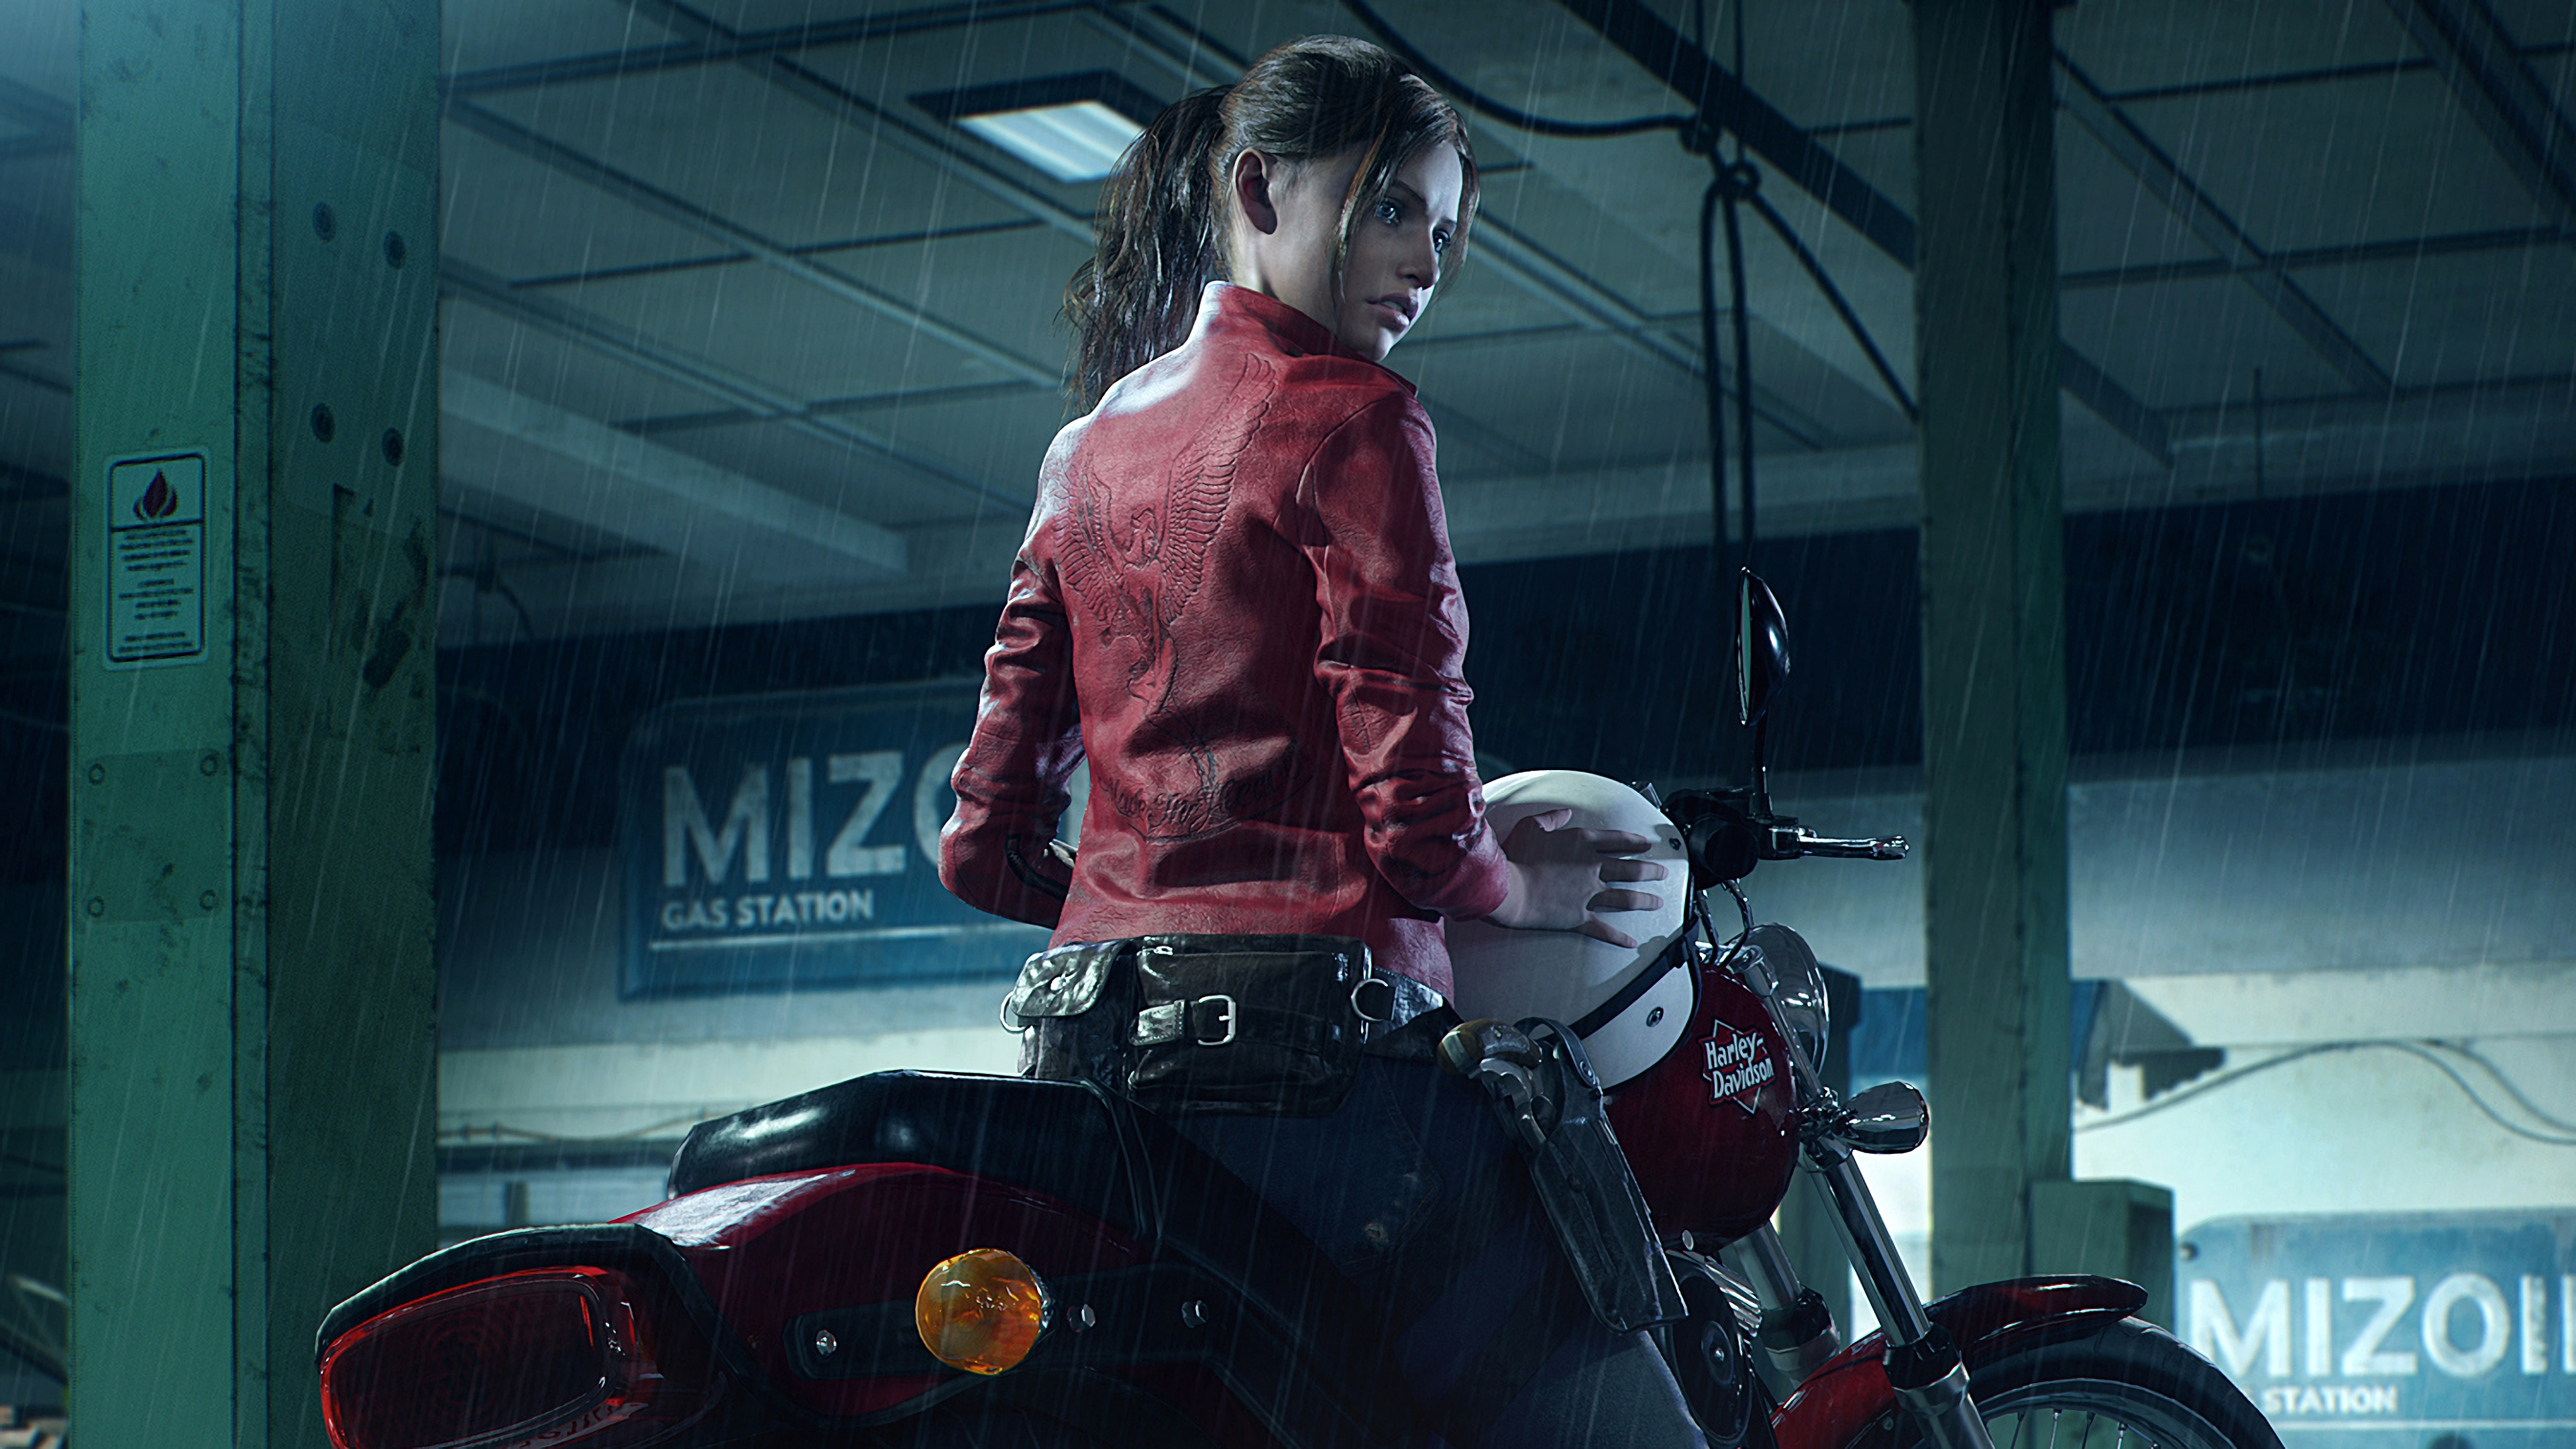 Leon S Kennedy Hd Wallpaper Resident Evil 2 Remake 4k 8k Hd Wallpaper